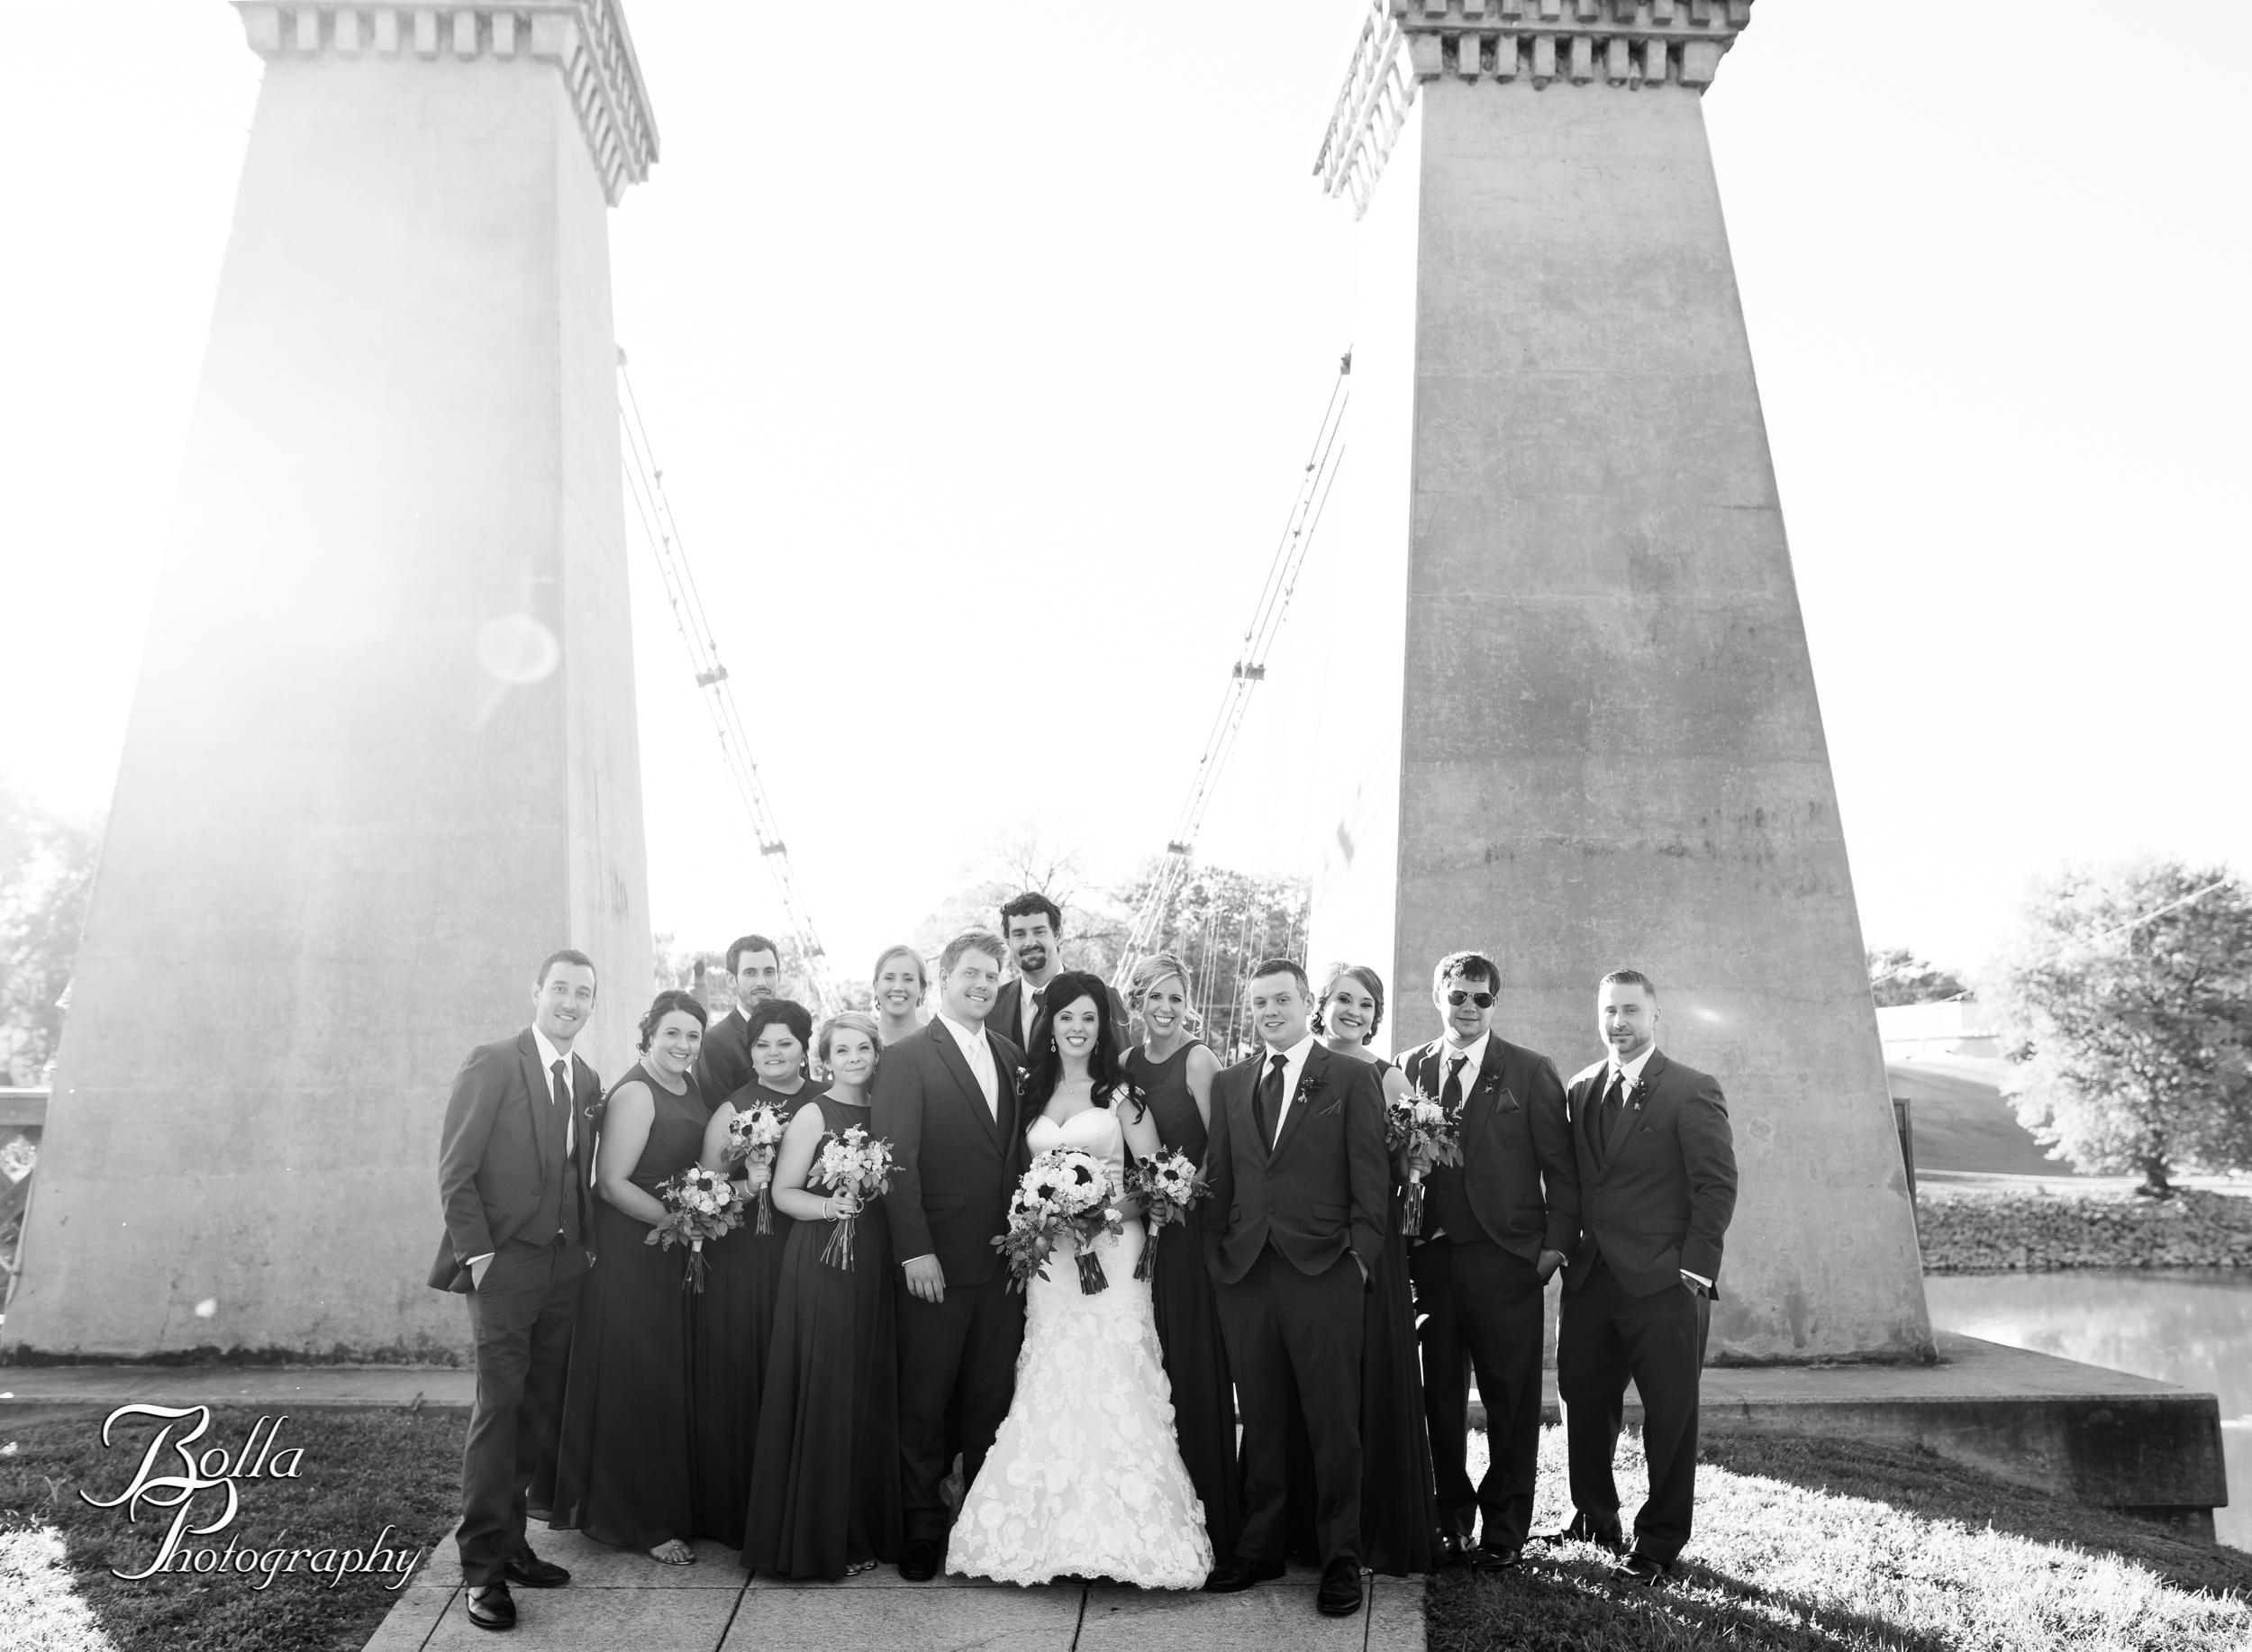 Bolla_photography_edwardsville_wedding_photographer_st_louis_weddings_Reilmann-0392.jpg